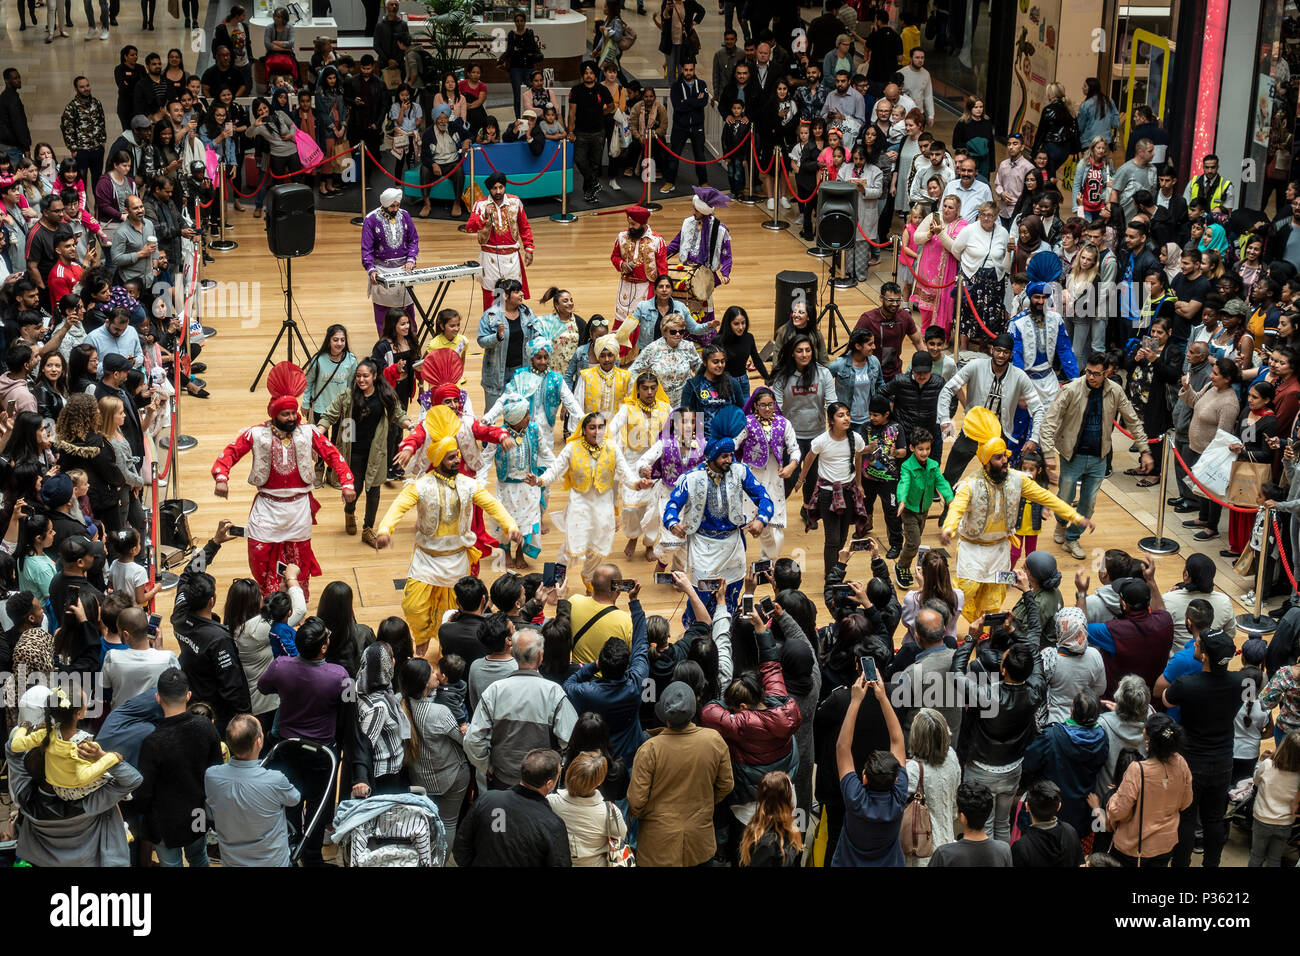 Lions of Punjab, Cubs of Punjab and audience participation; Bhangra dance; Bullring, Birmingham - Stock Image